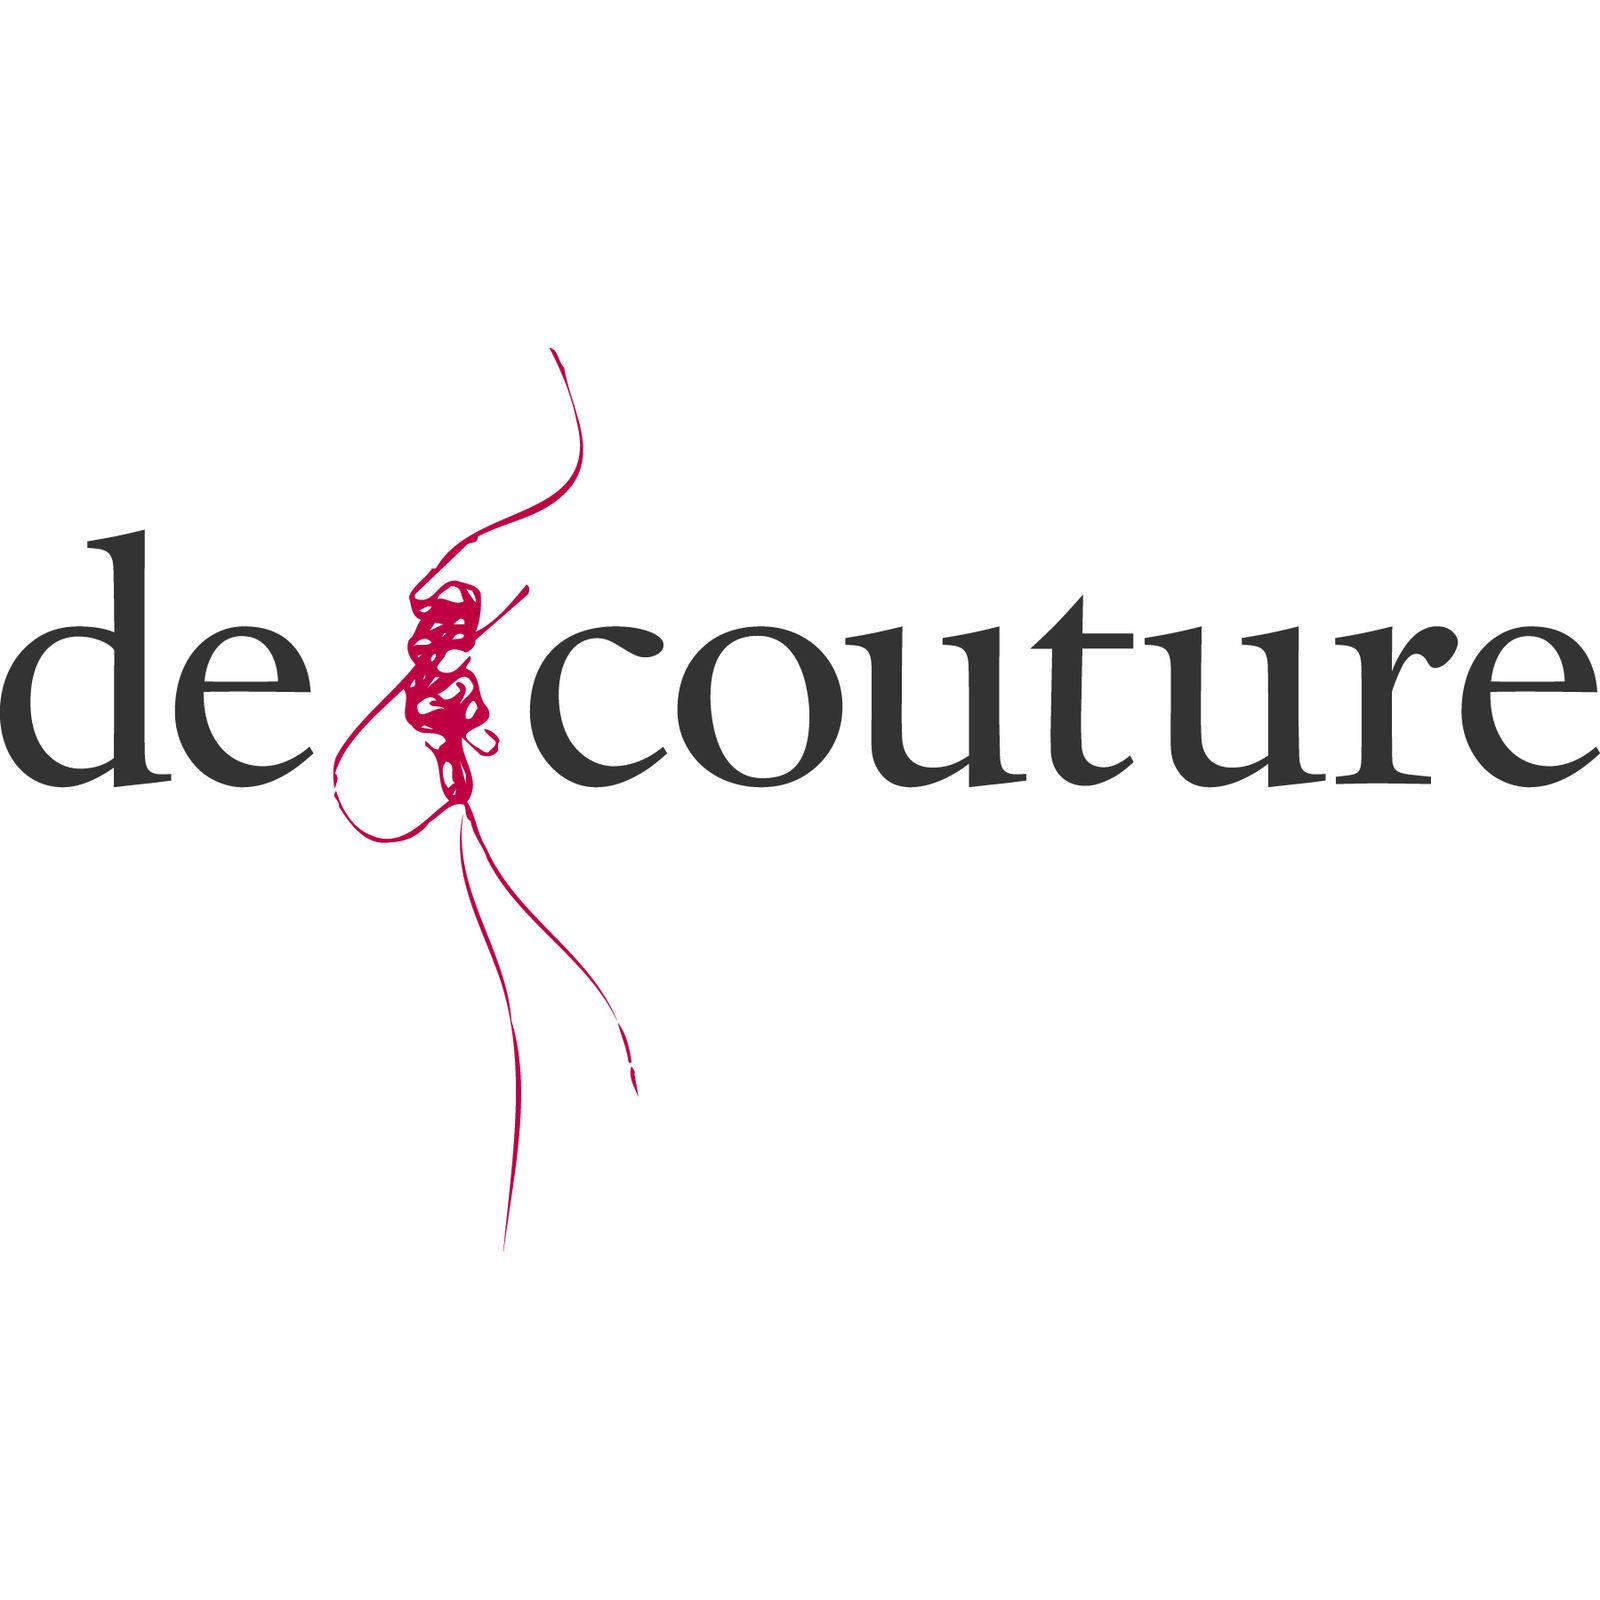 de couture